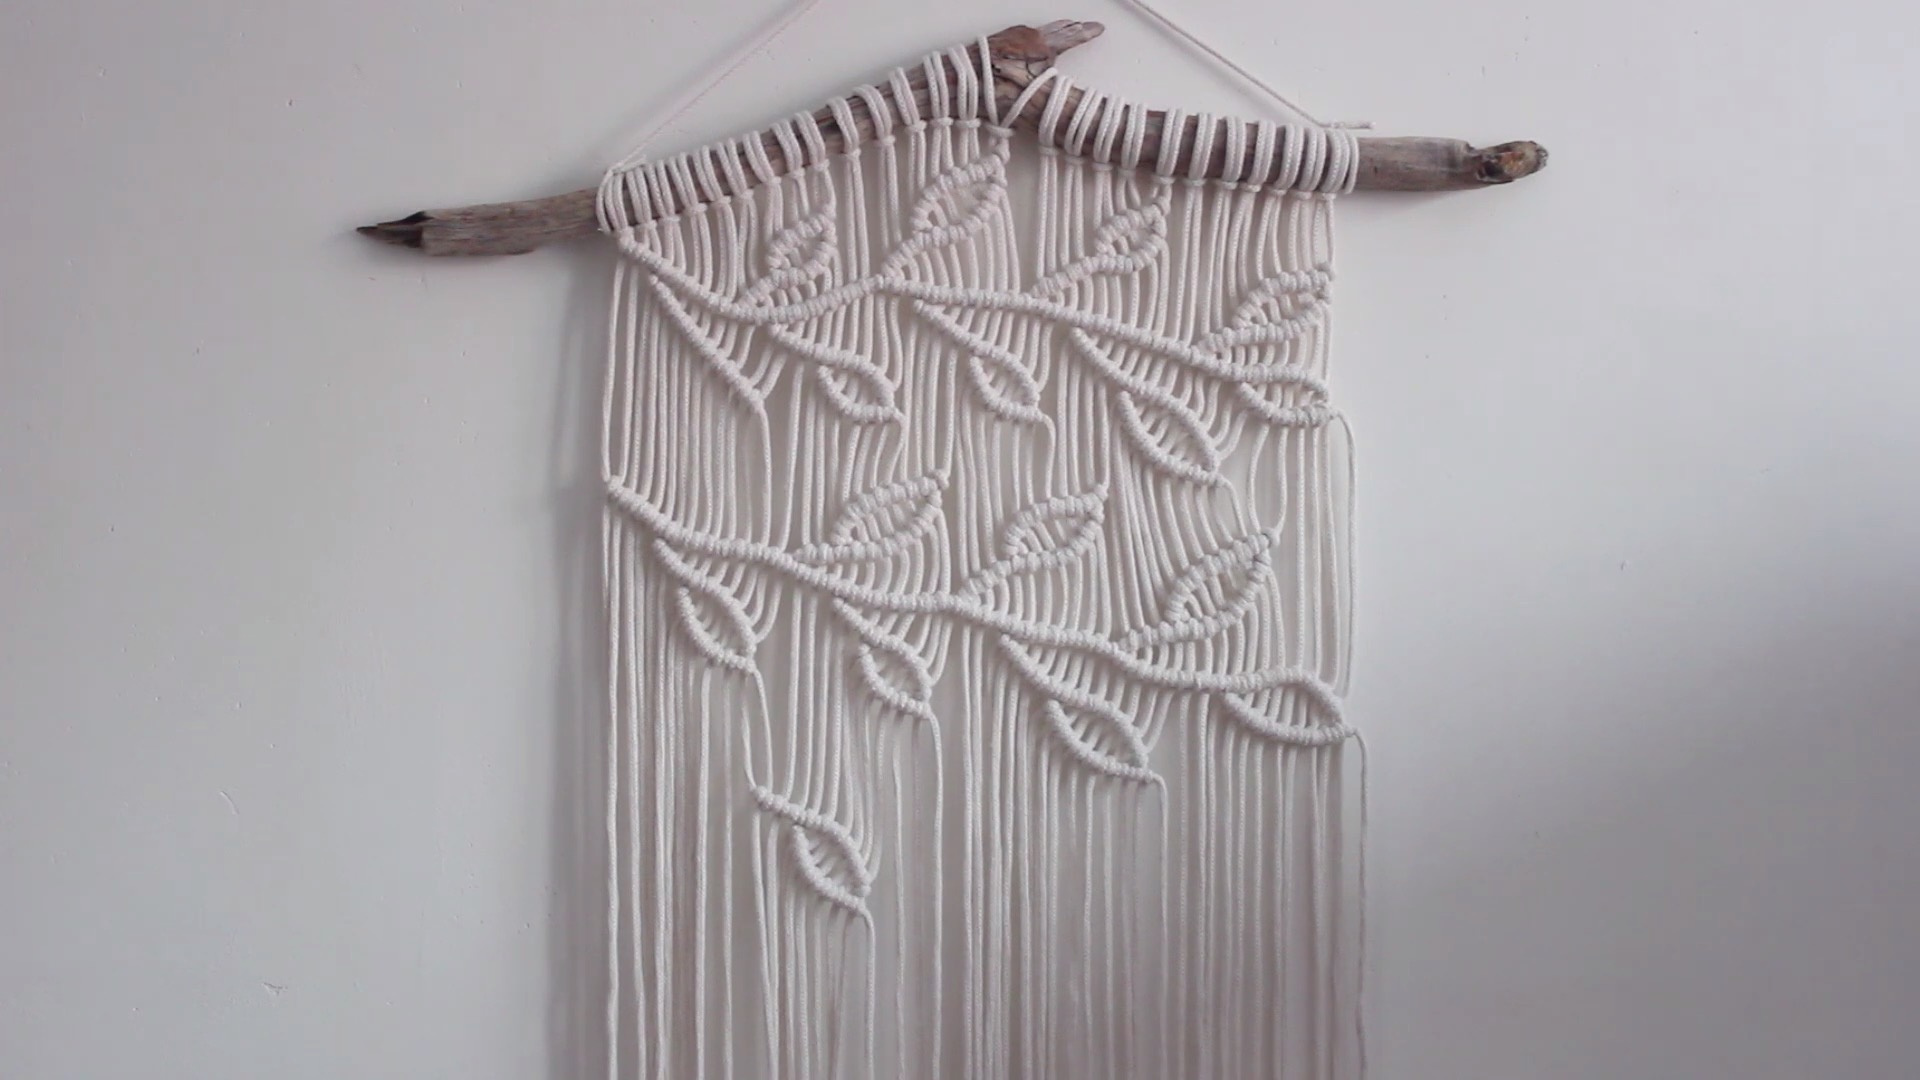 DIY Macrame结绳挂毯:简单而美观的藤蔓造型挂毯